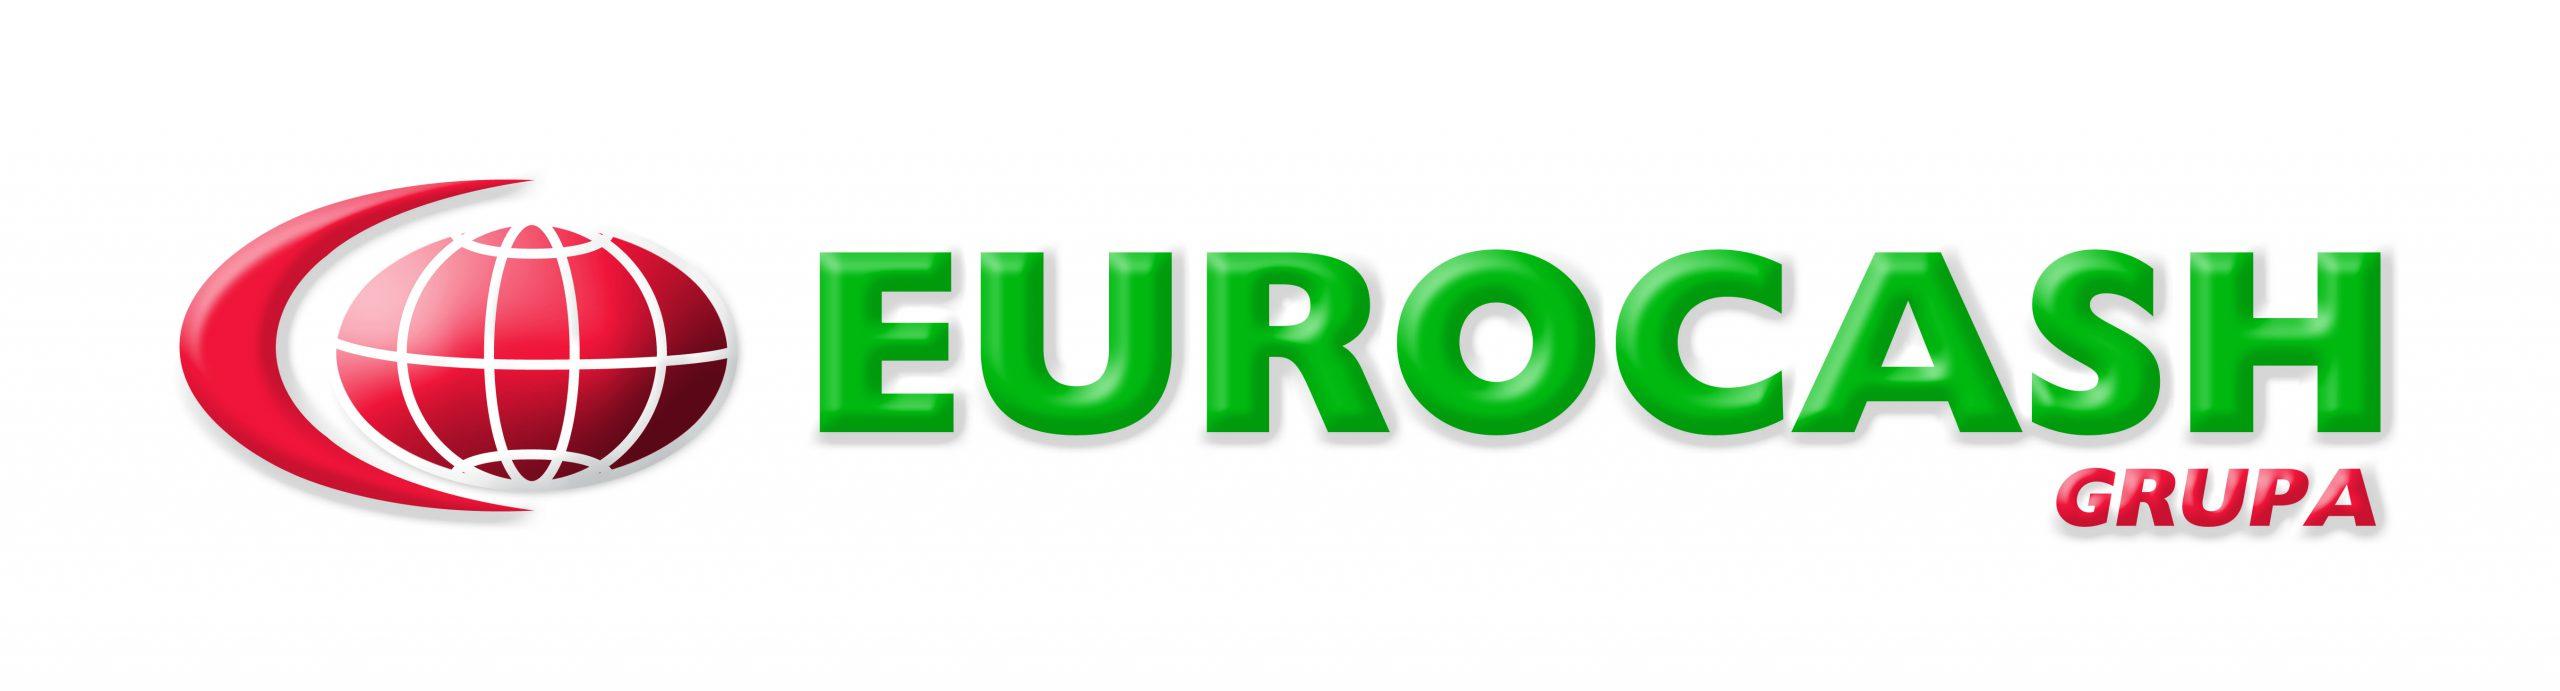 Grupa Eurocash podsumowuje 2018 r.